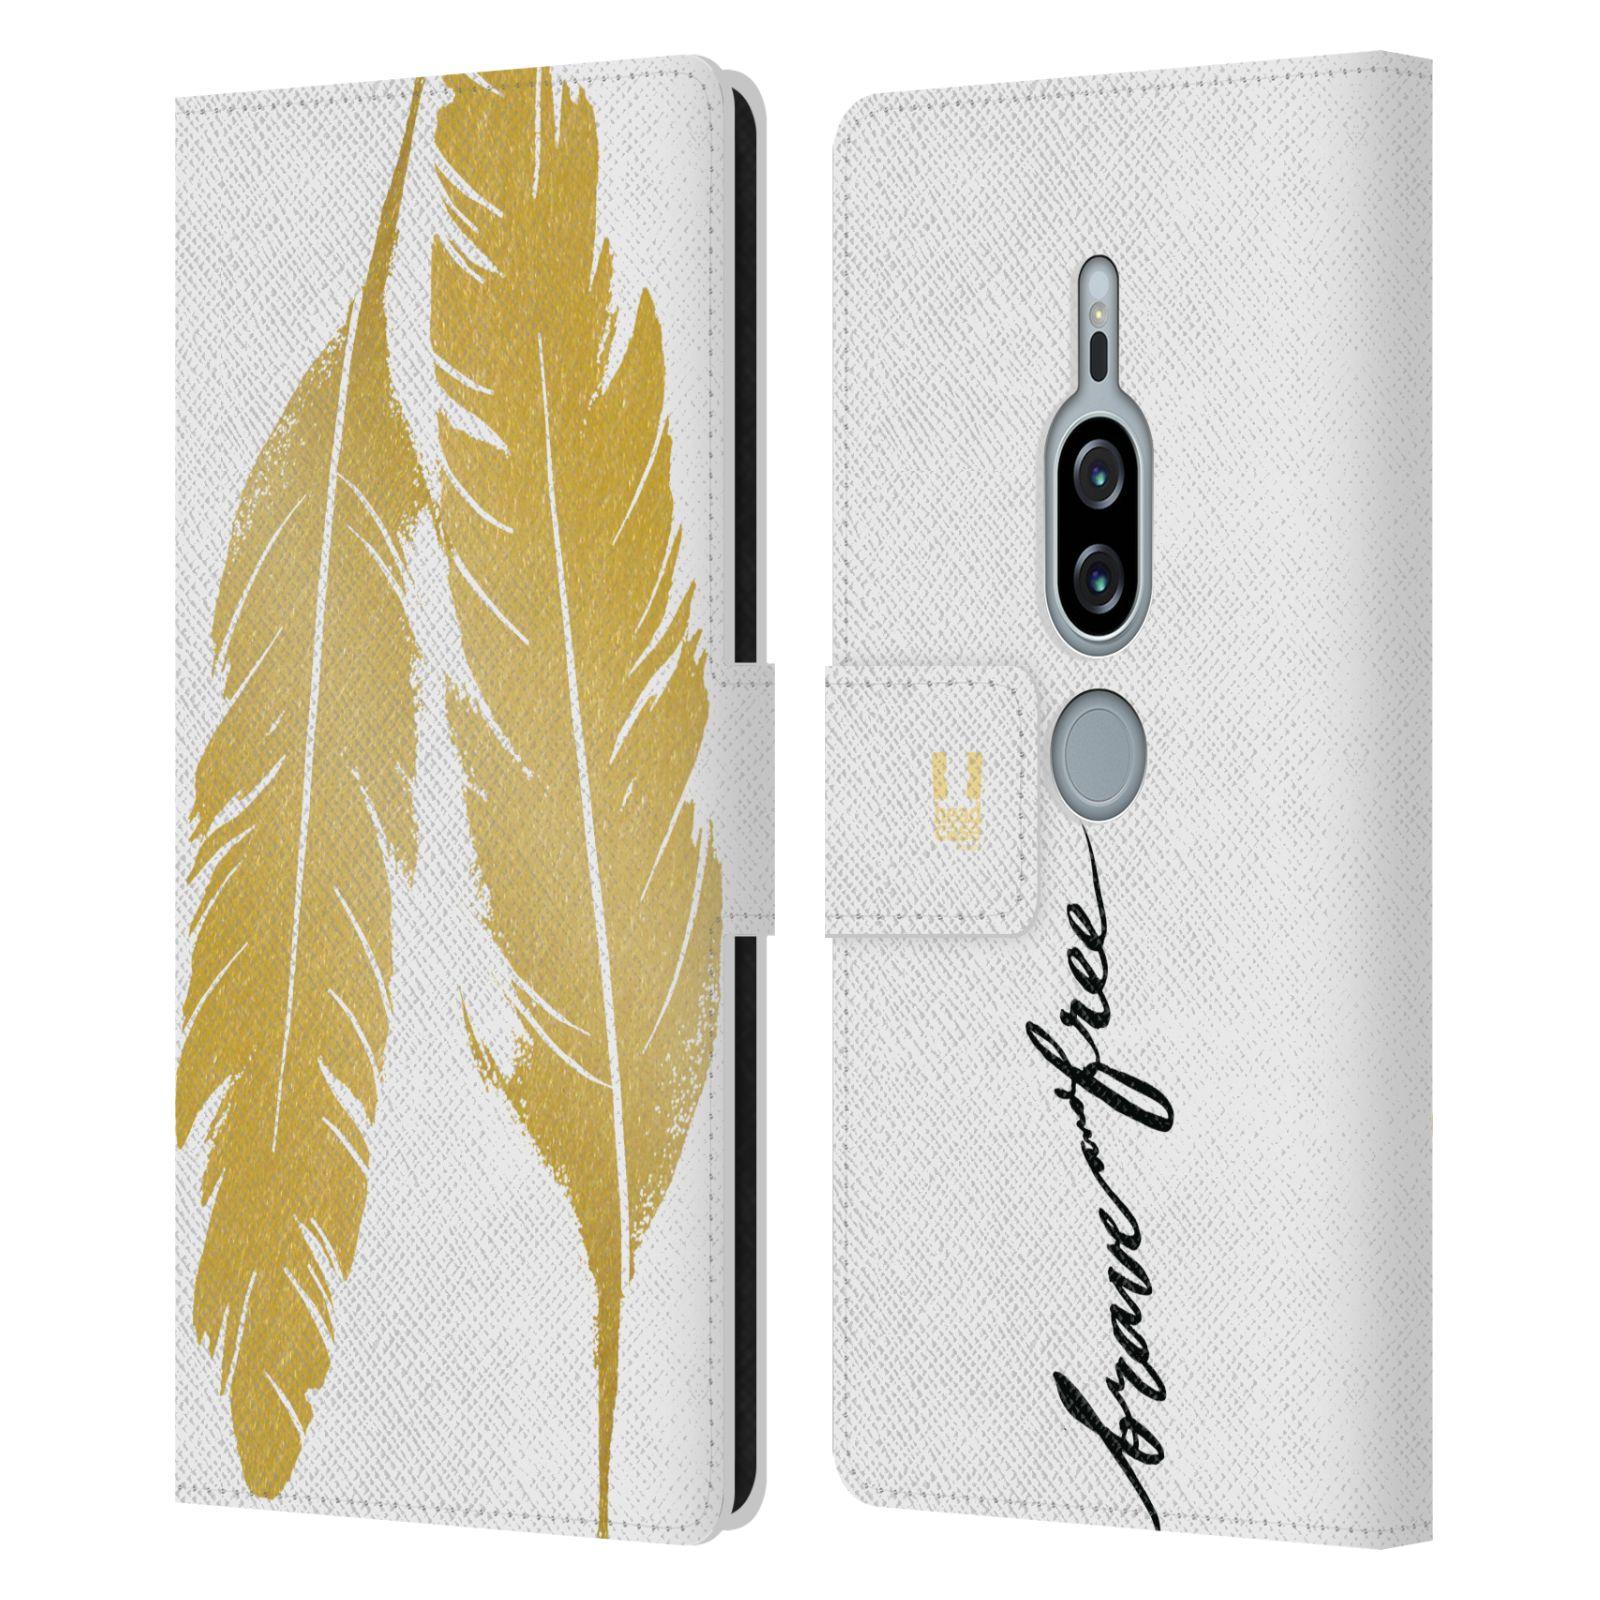 Pouzdro na mobil Sony Xperia XZ2 Premium - Head Case - Fashion zlaté pírka